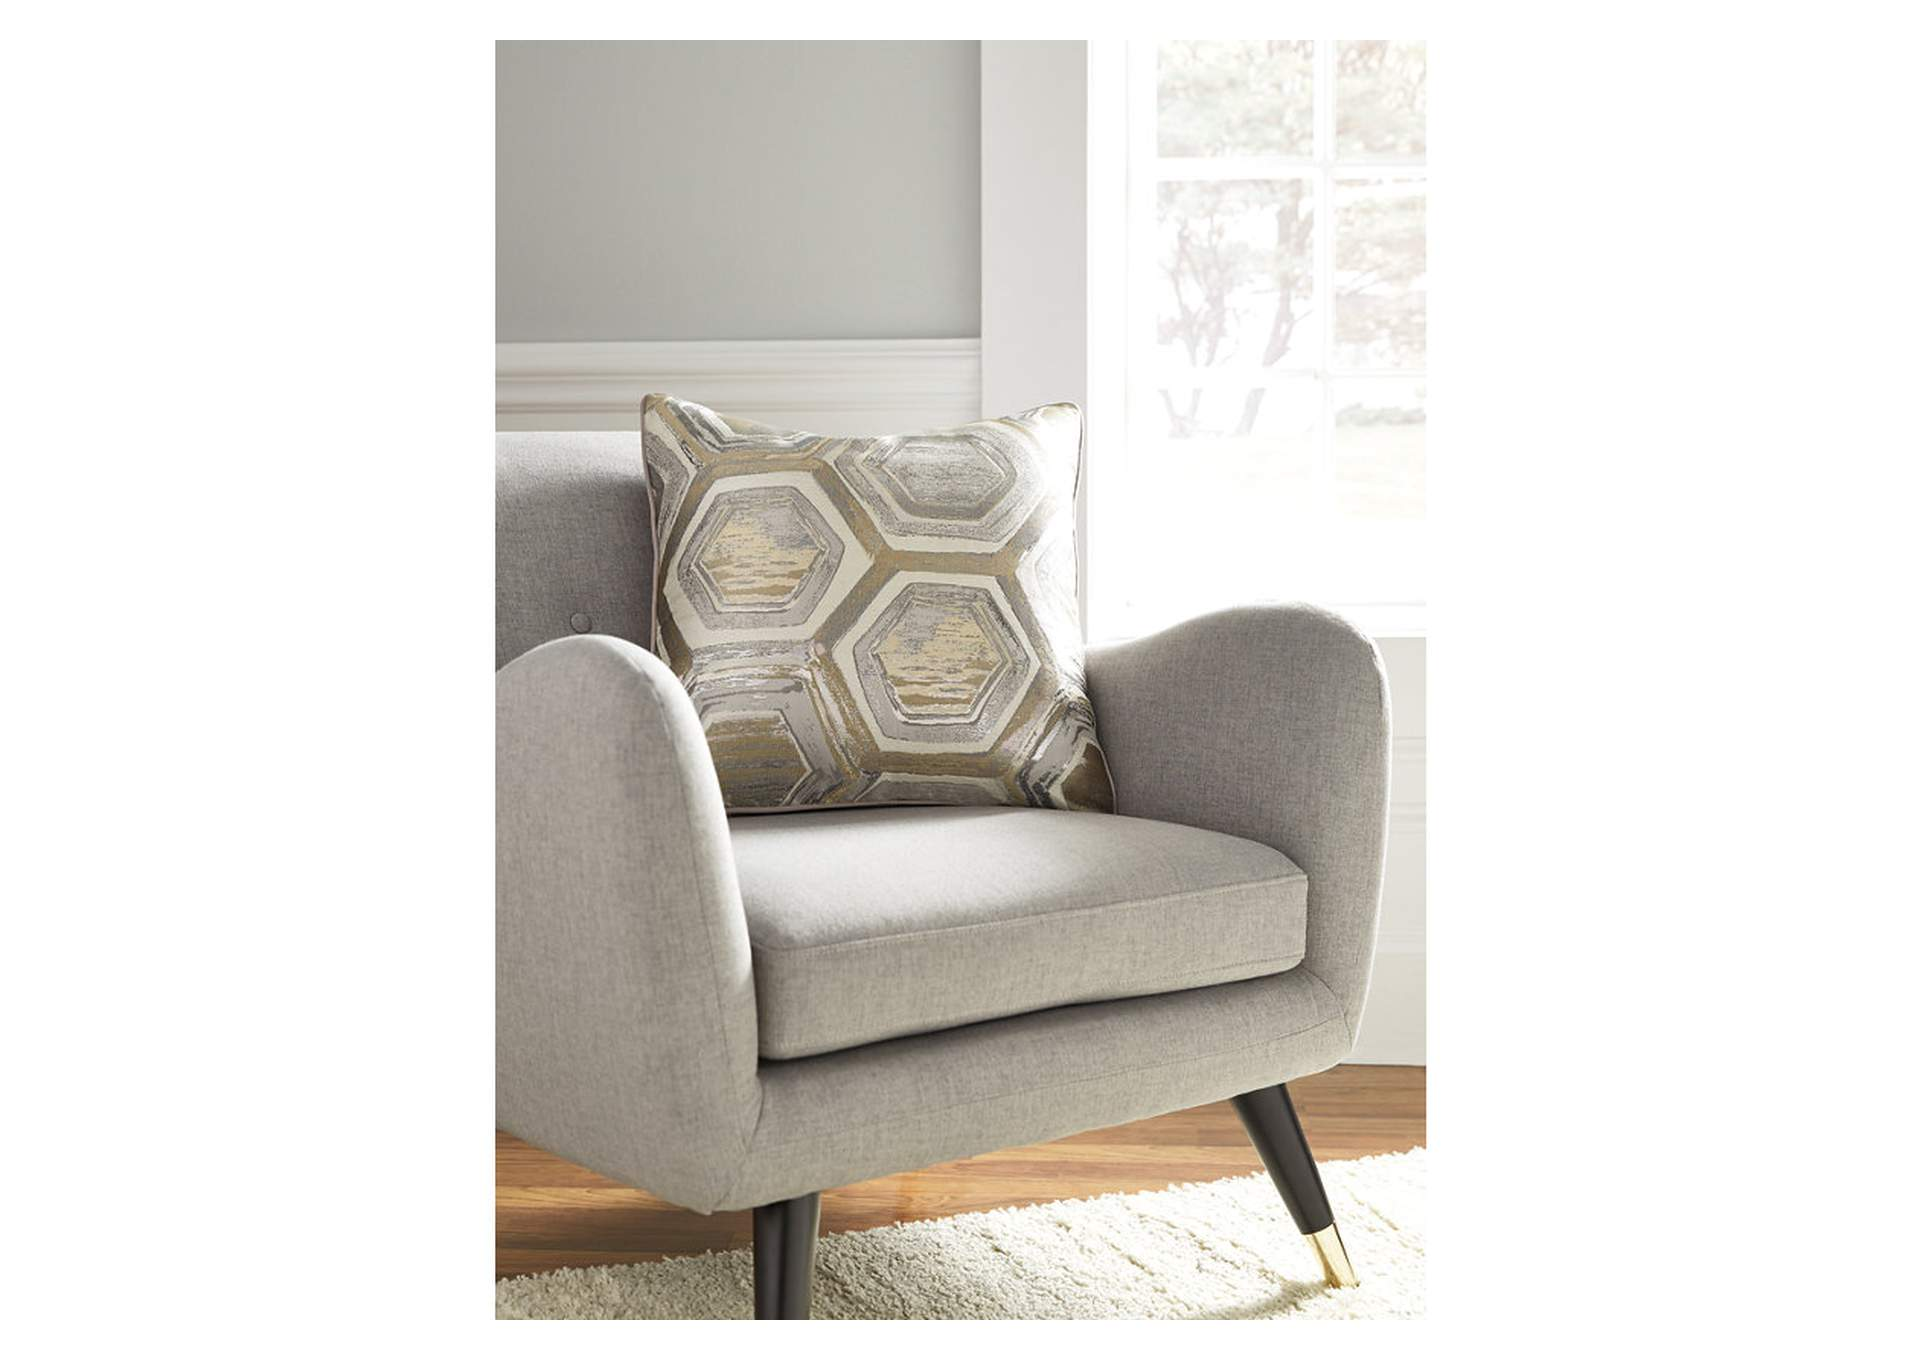 Charmant I Save More Furniture U0026 Mattress   Statesboro, GA Meiling Metallic Pillow  (4/CS)